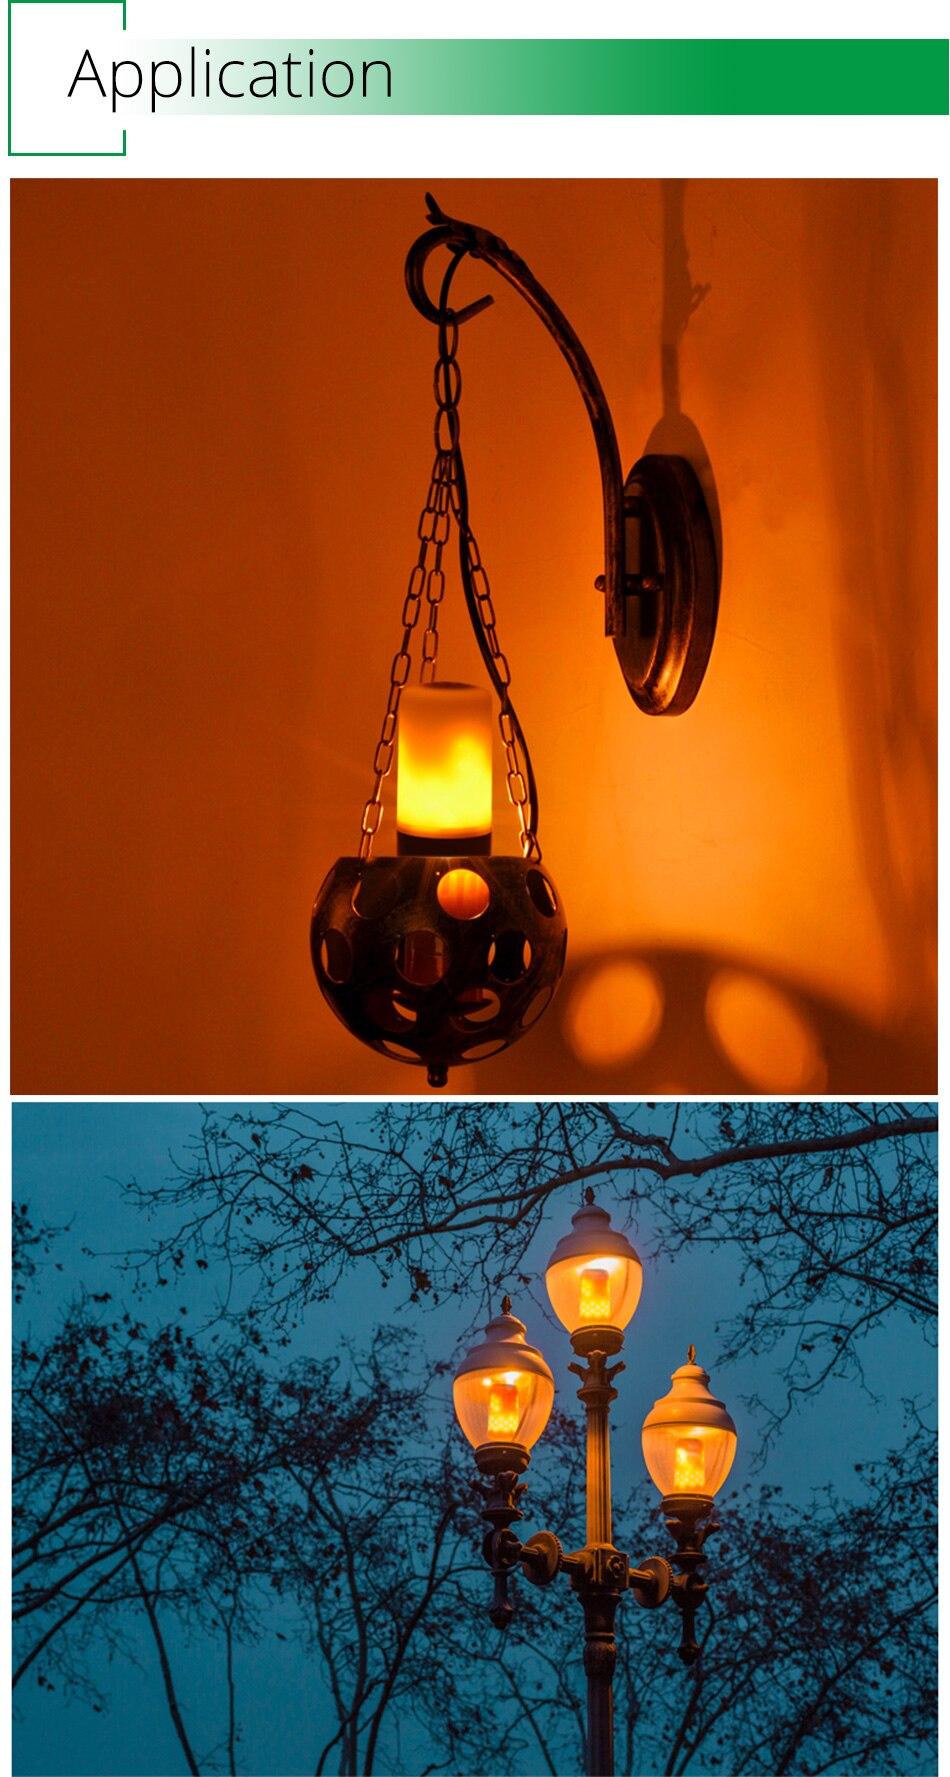 LED Flame Lamp Solar Waterproof Lawn Light Dancing Flickering Torch Lights Garden Outdoor Landscape Decorative Path Lighting (21)